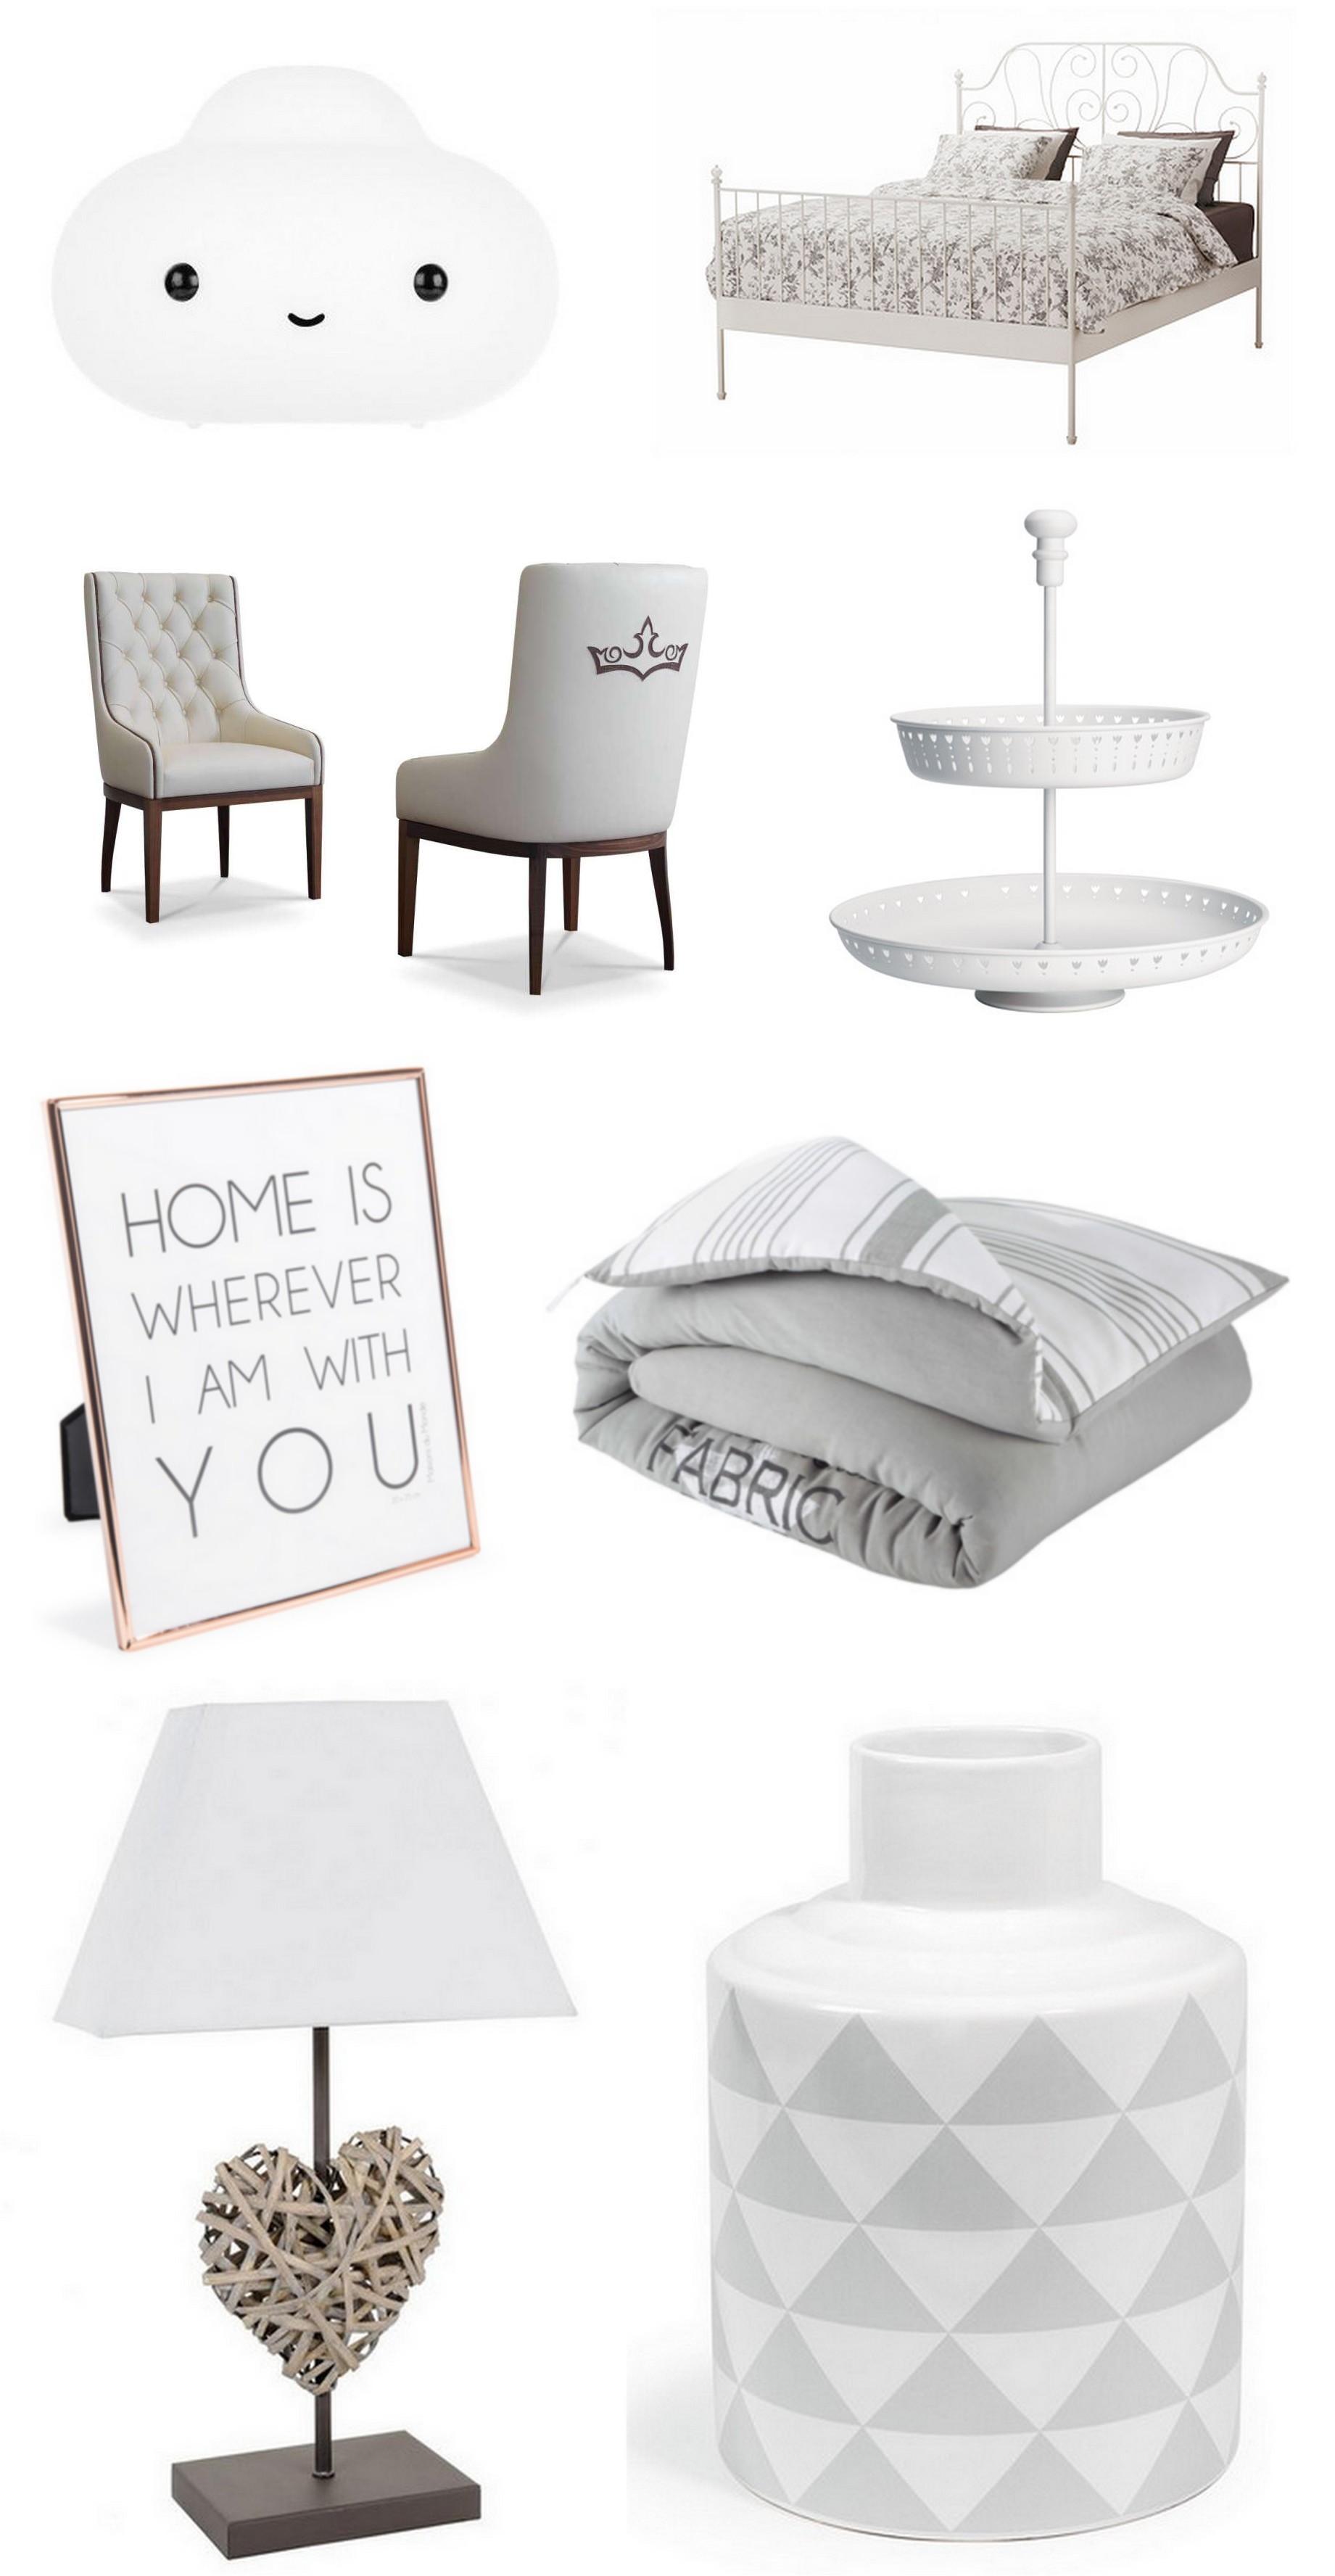 s lection d co 2 la caverne a bibijoul. Black Bedroom Furniture Sets. Home Design Ideas